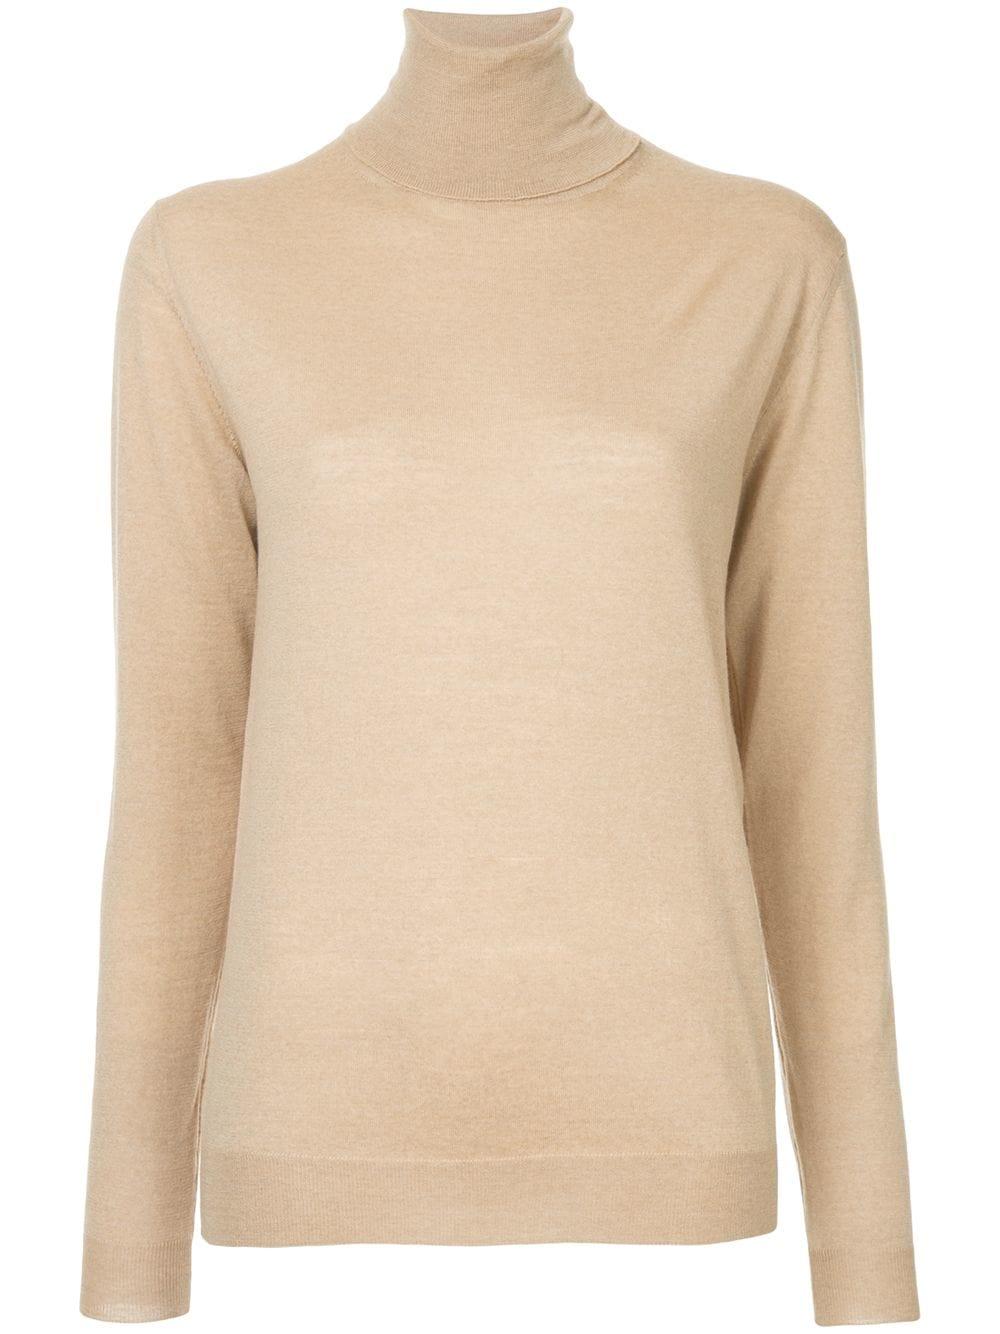 Stella McCartney turtleneck sweater - shop